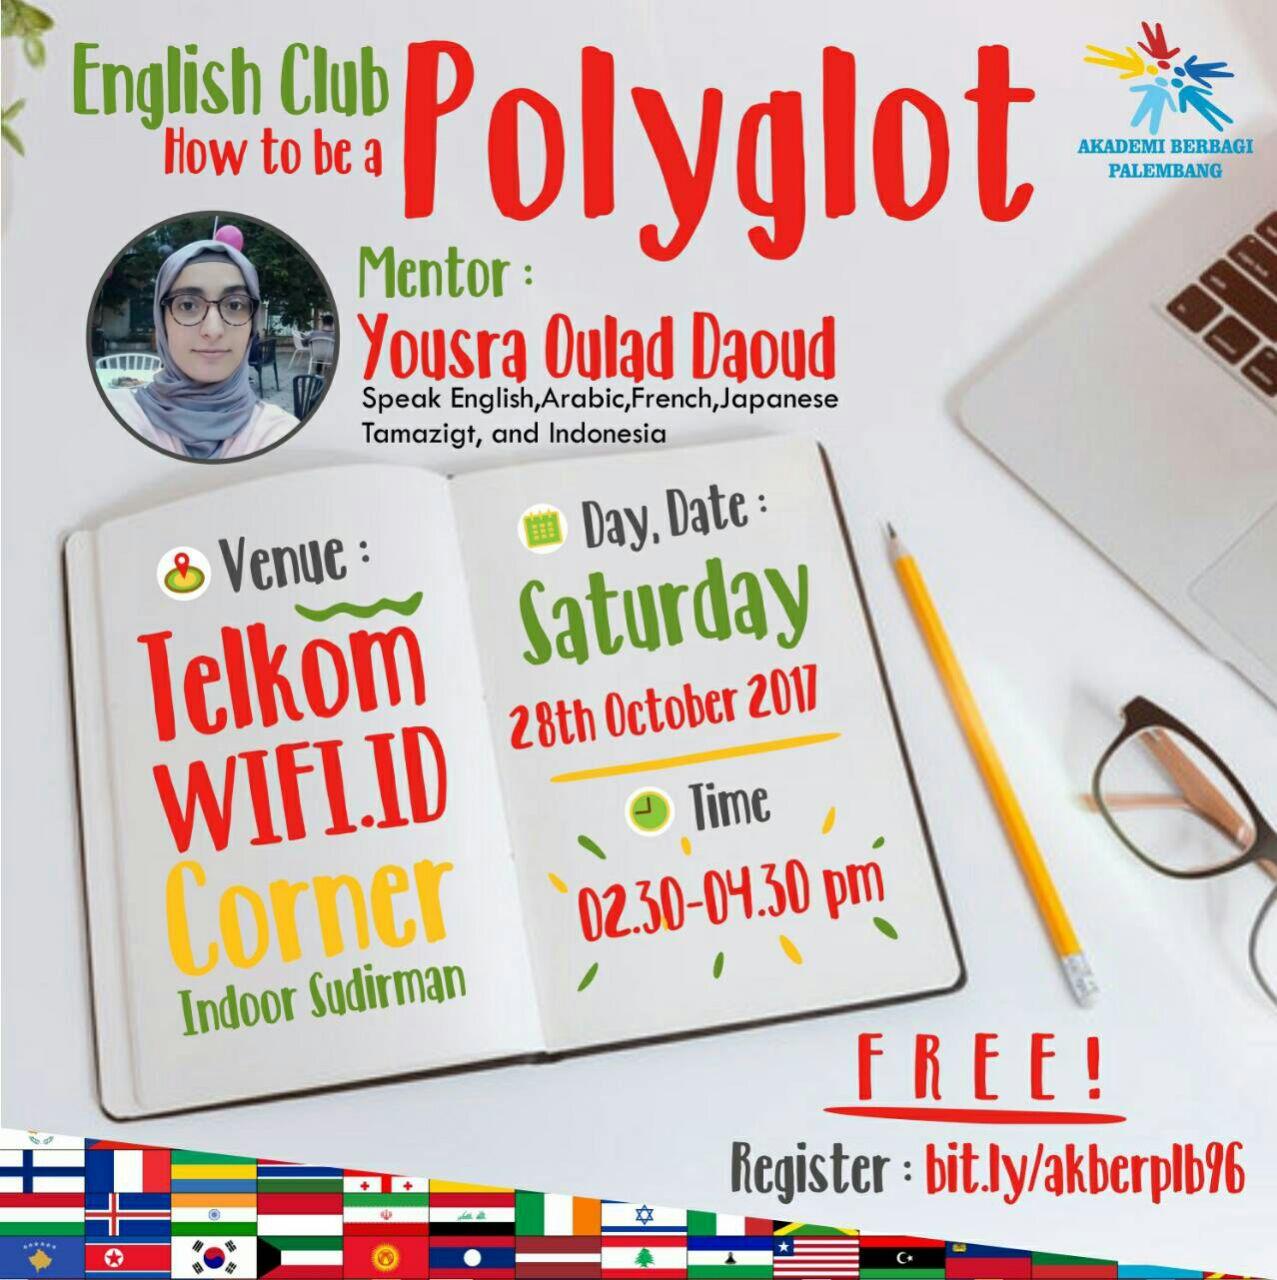 Palembang: English Club – How To Be Polyglot